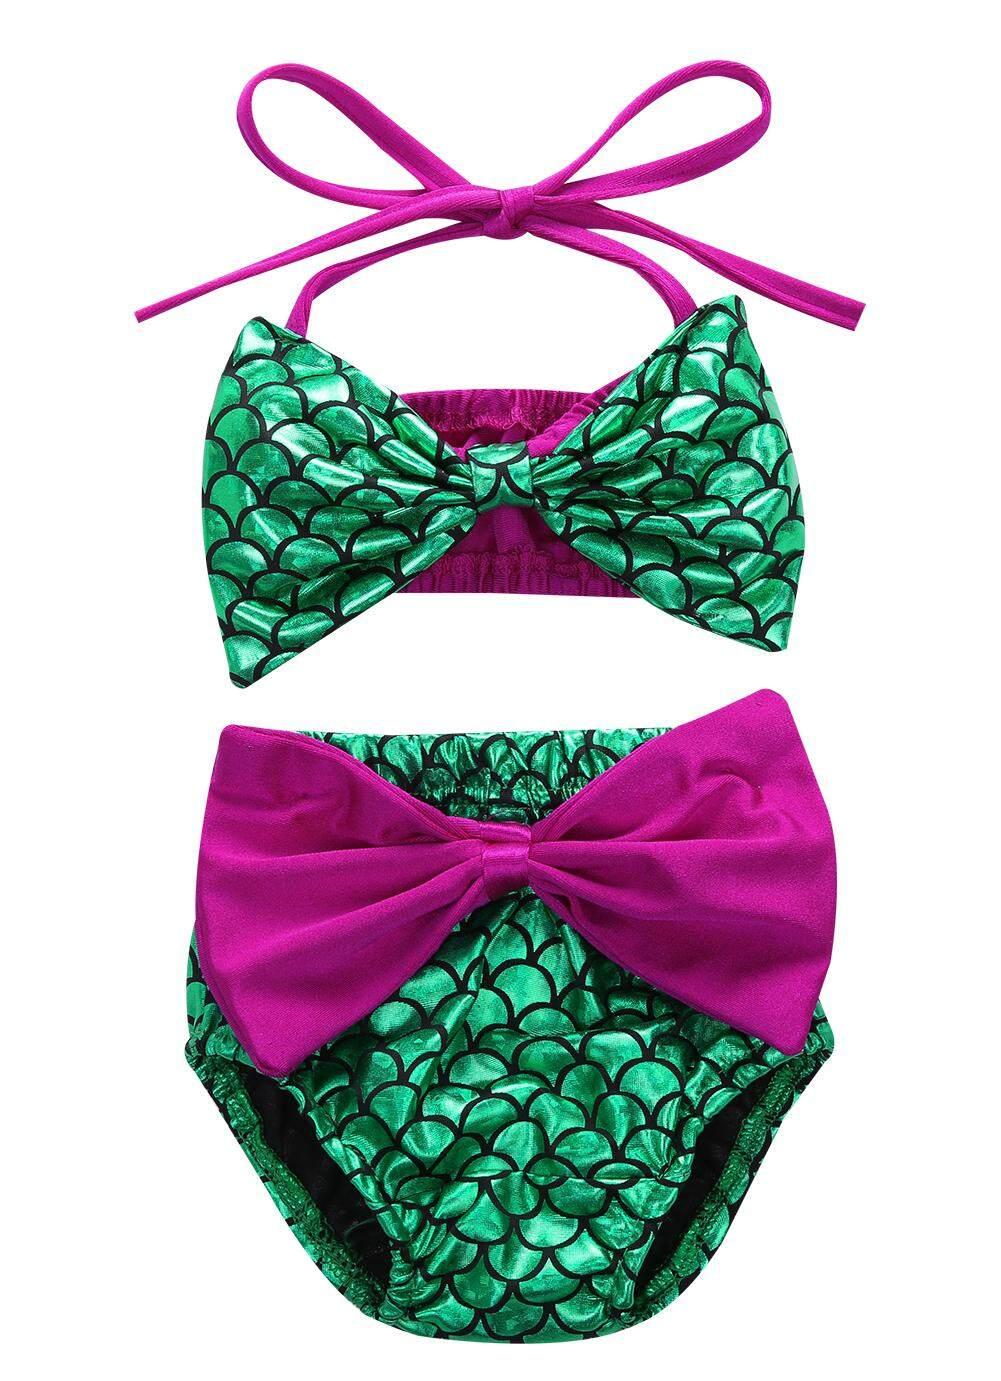 525ba7f7092 Toddler Baby Girls Mermaid Bowknot Swimsuit Swimwear Summer Bikini Set 0-24M